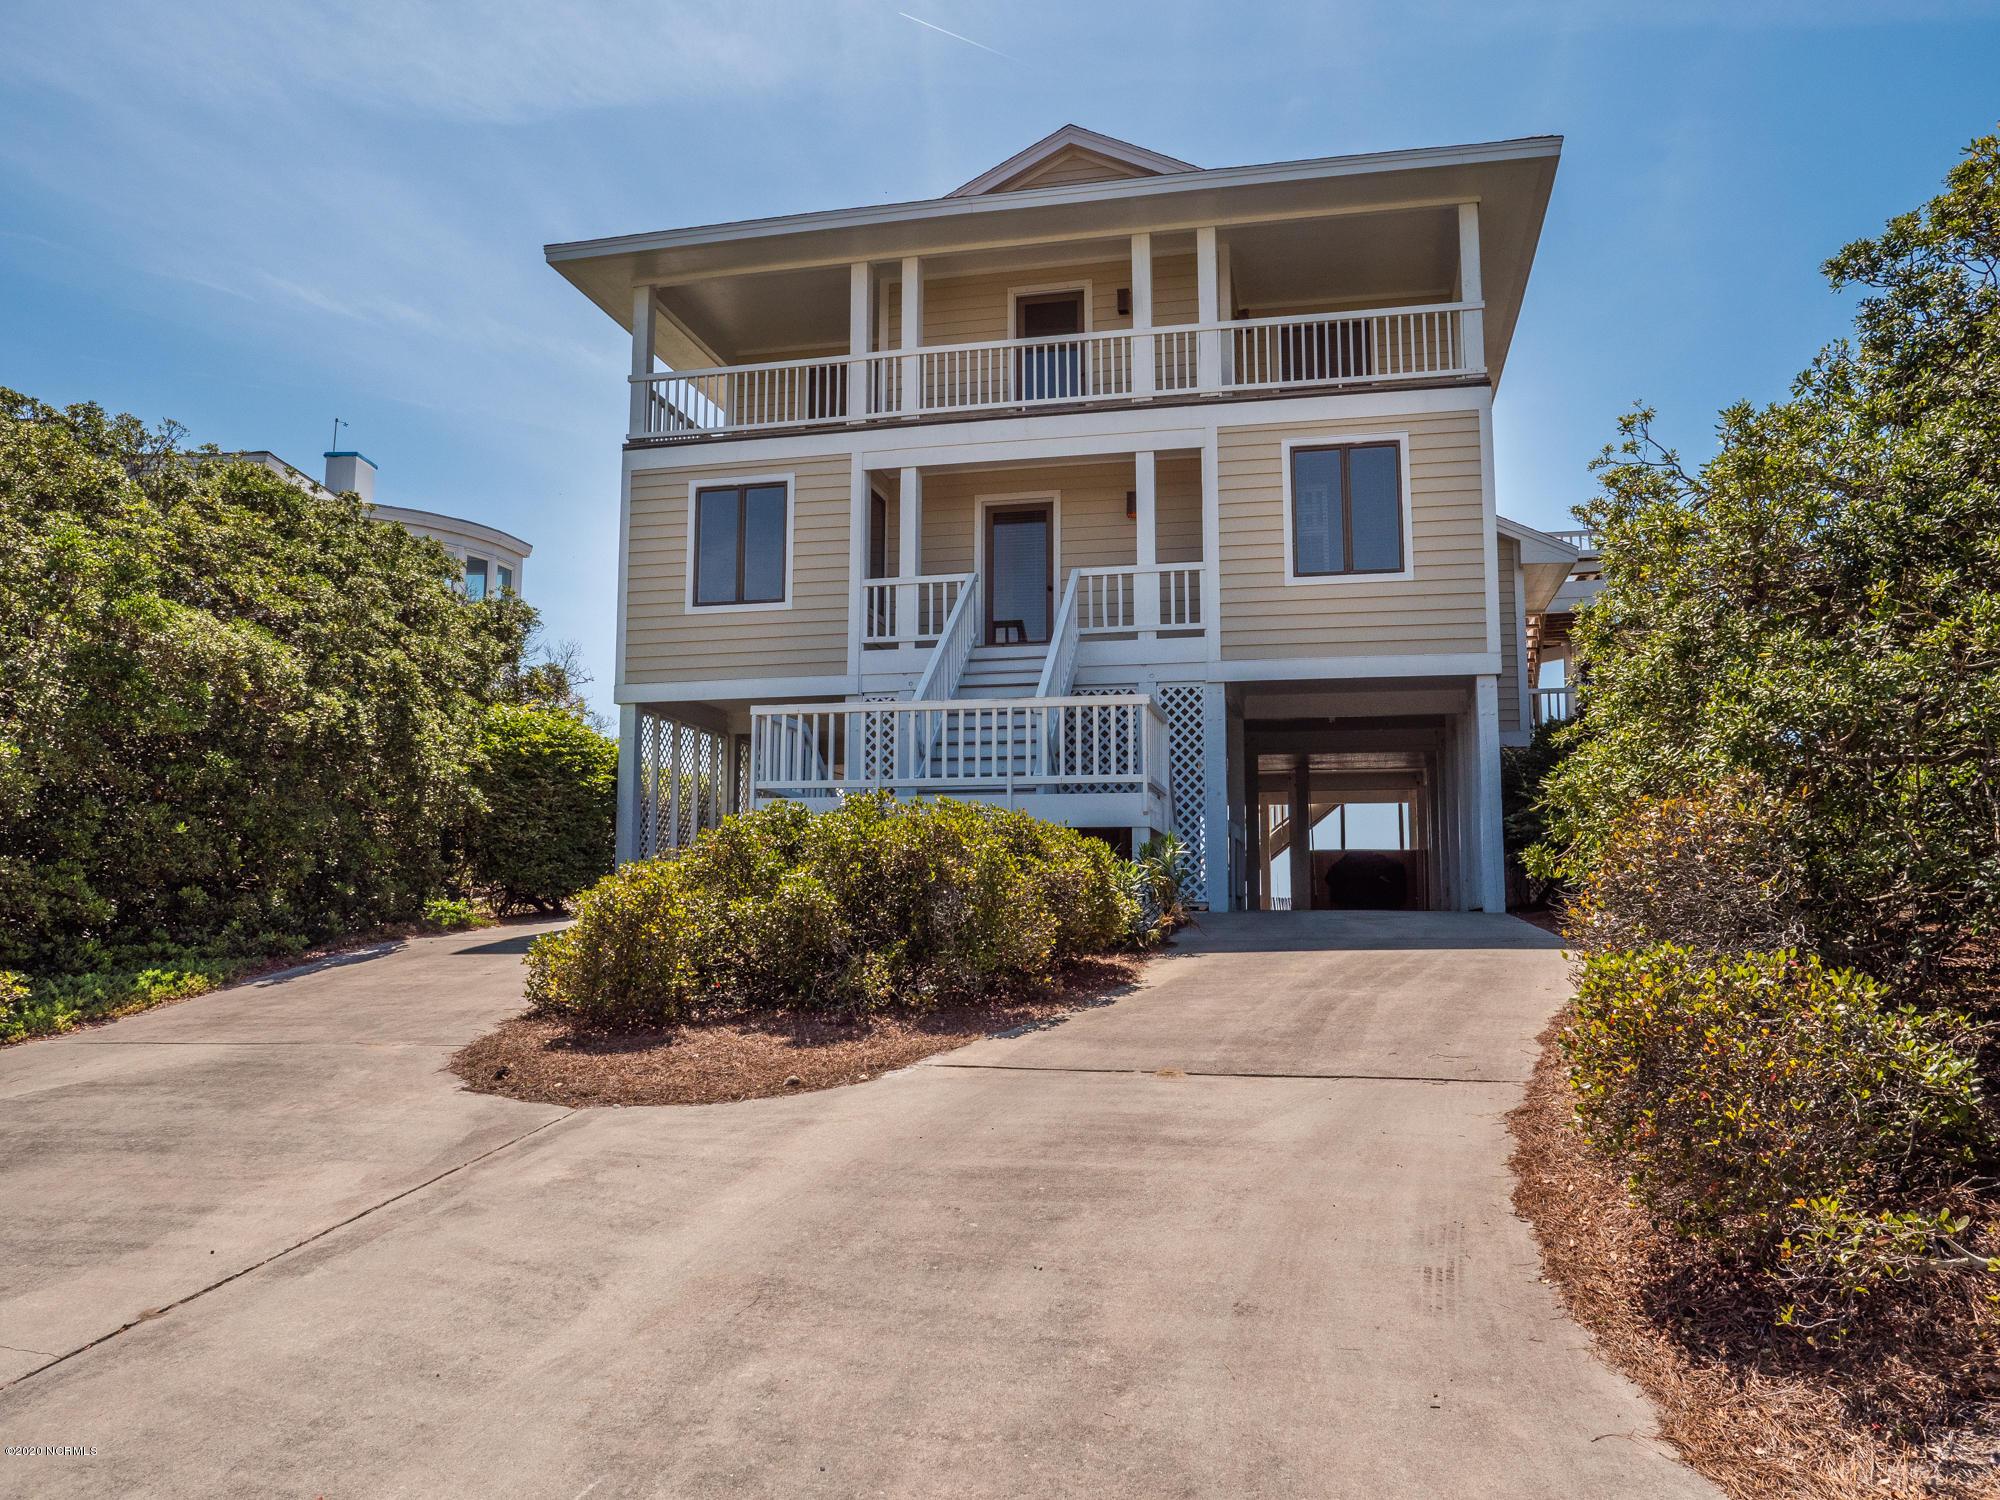 15 Comber Road, Wilmington, North Carolina 28411, 4 Bedrooms Bedrooms, ,3 BathroomsBathrooms,Residential,For Sale,Comber,100221889